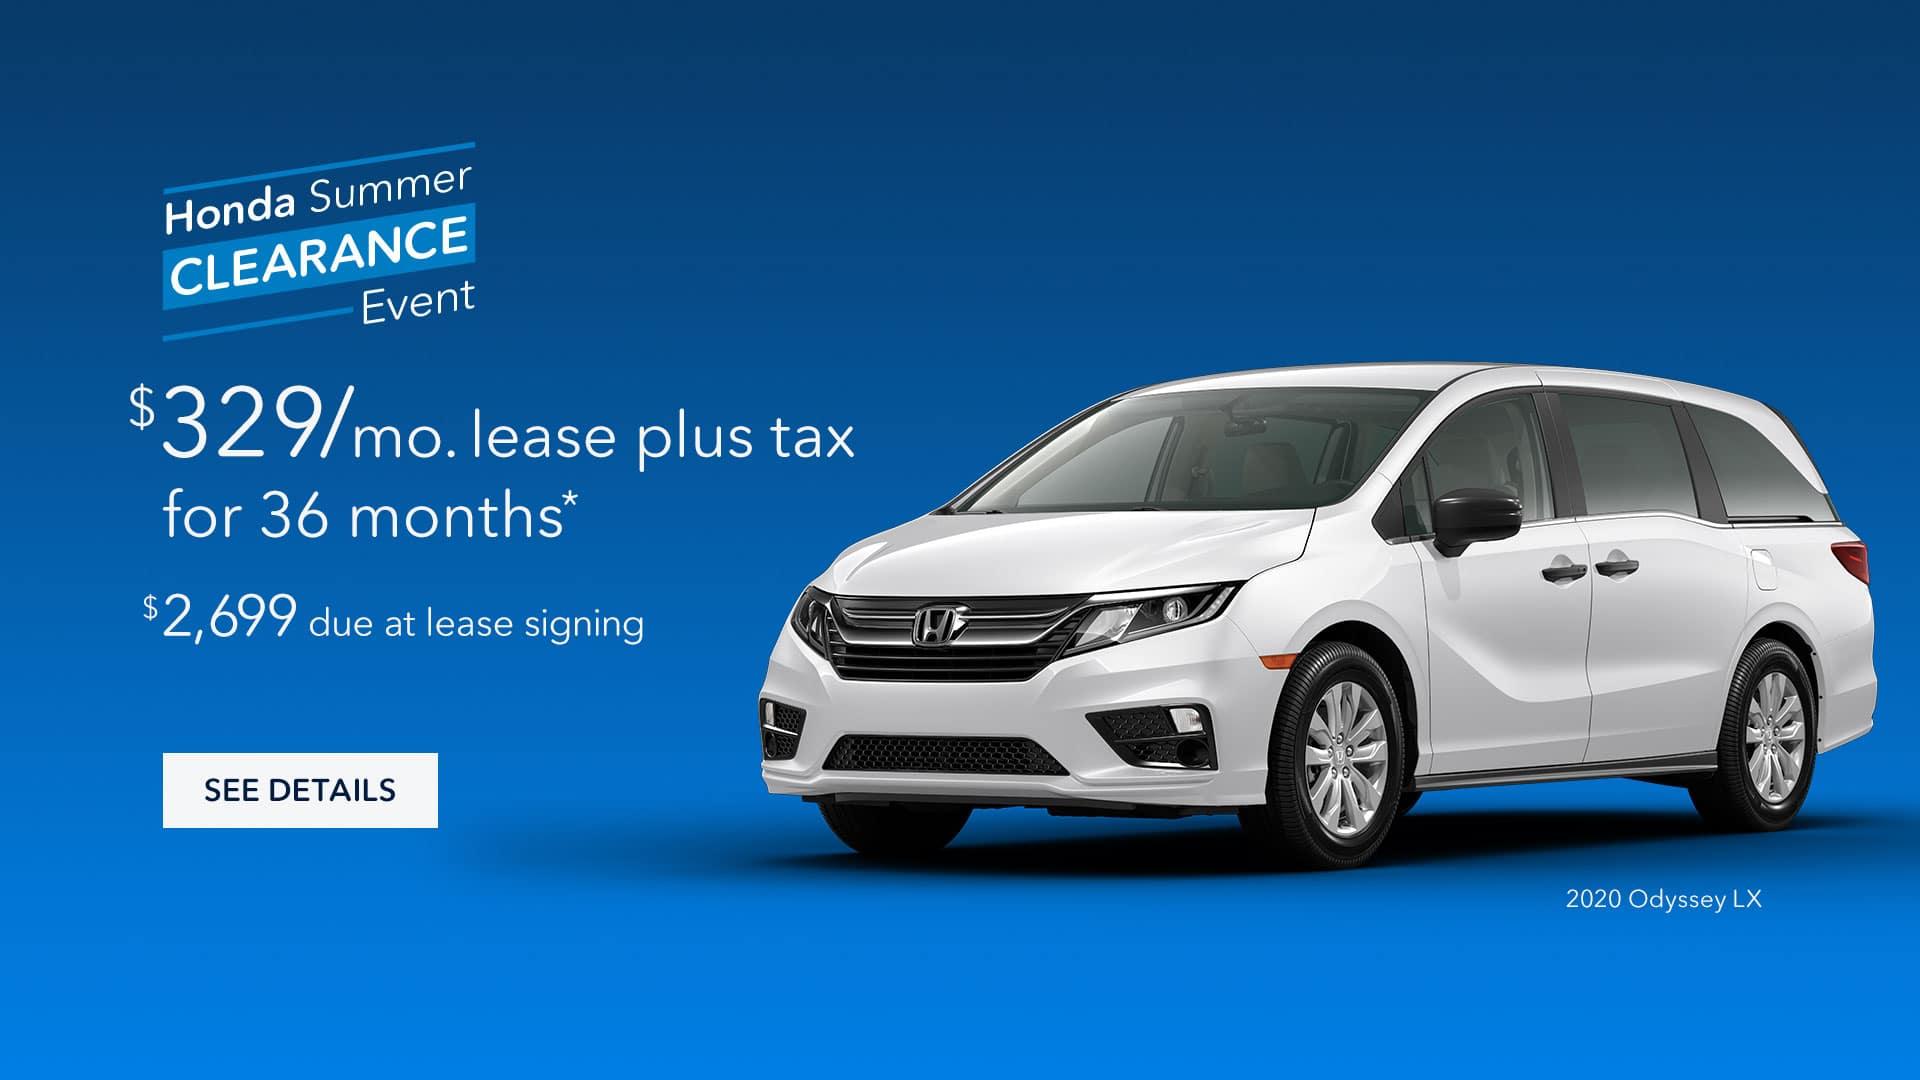 Lease a 2020 Honda Odyssey for $329/mo